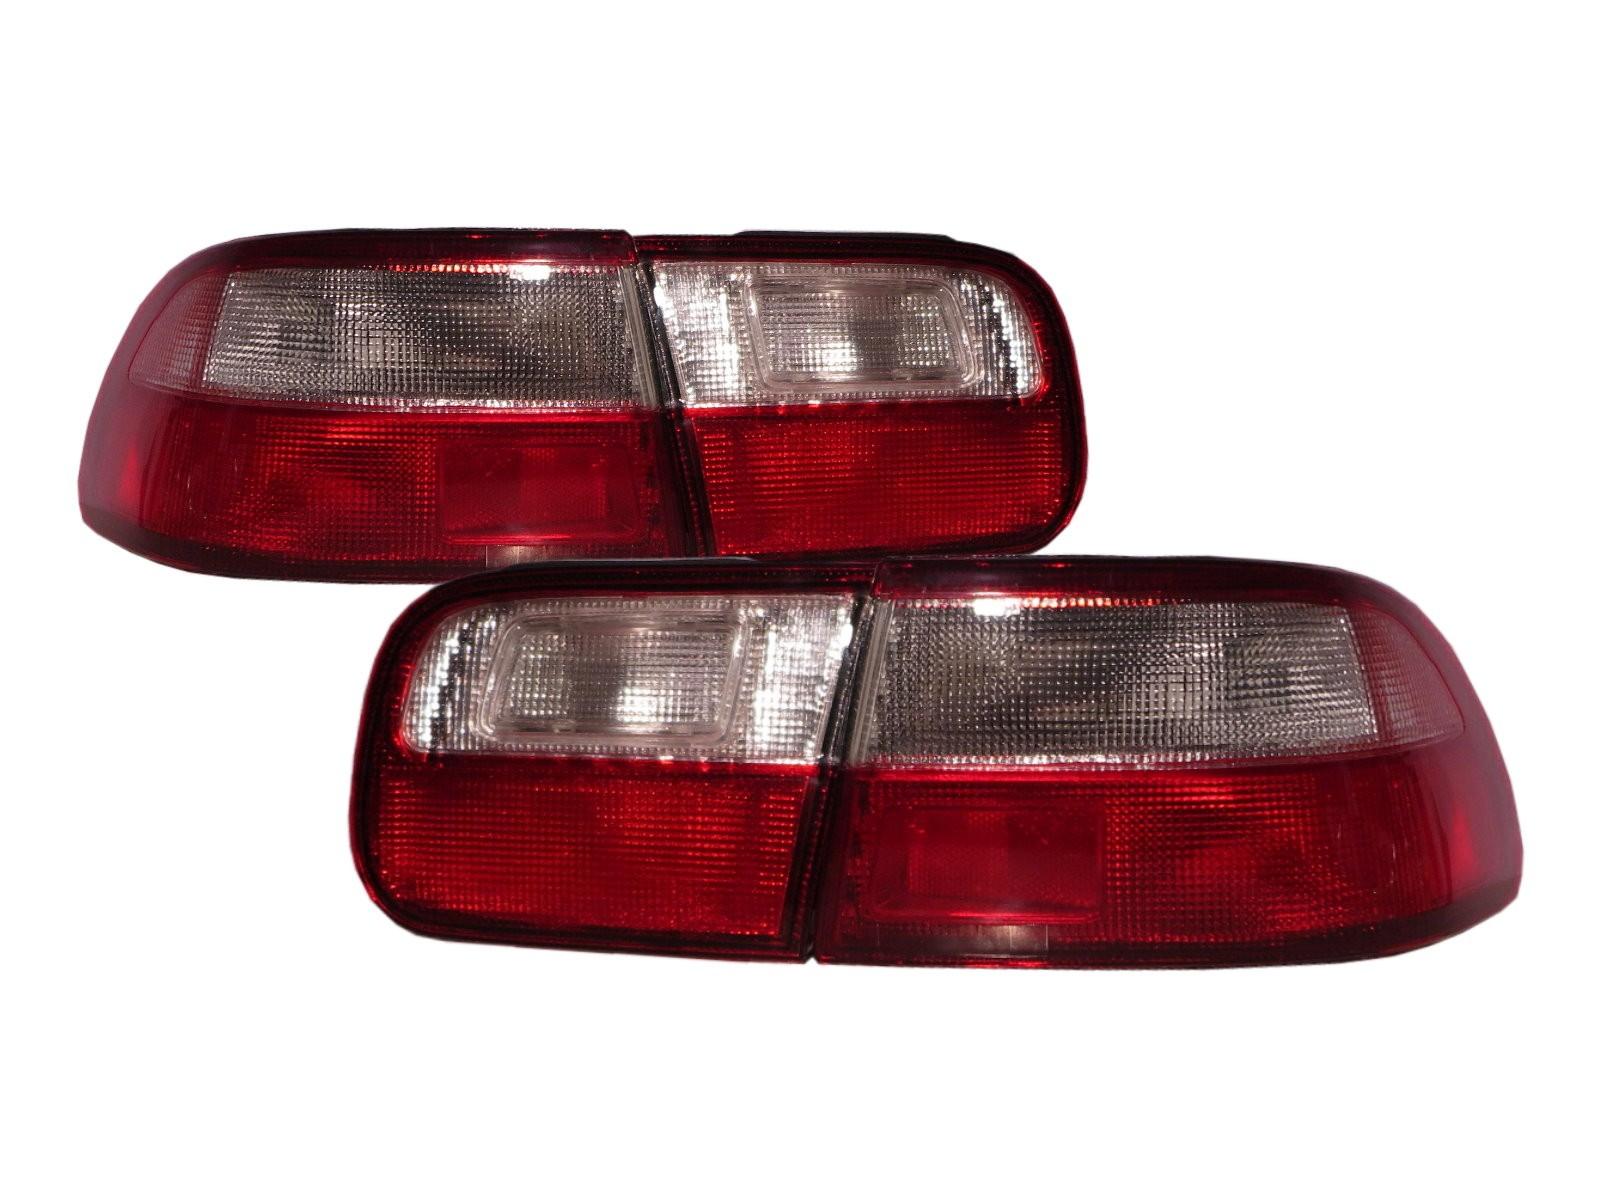 CrazyTheGod Civic EG/EH/EJ Fifth generation 1992-1995 Sedan 4D Clear Tail Rear Light Red/White for HONDA